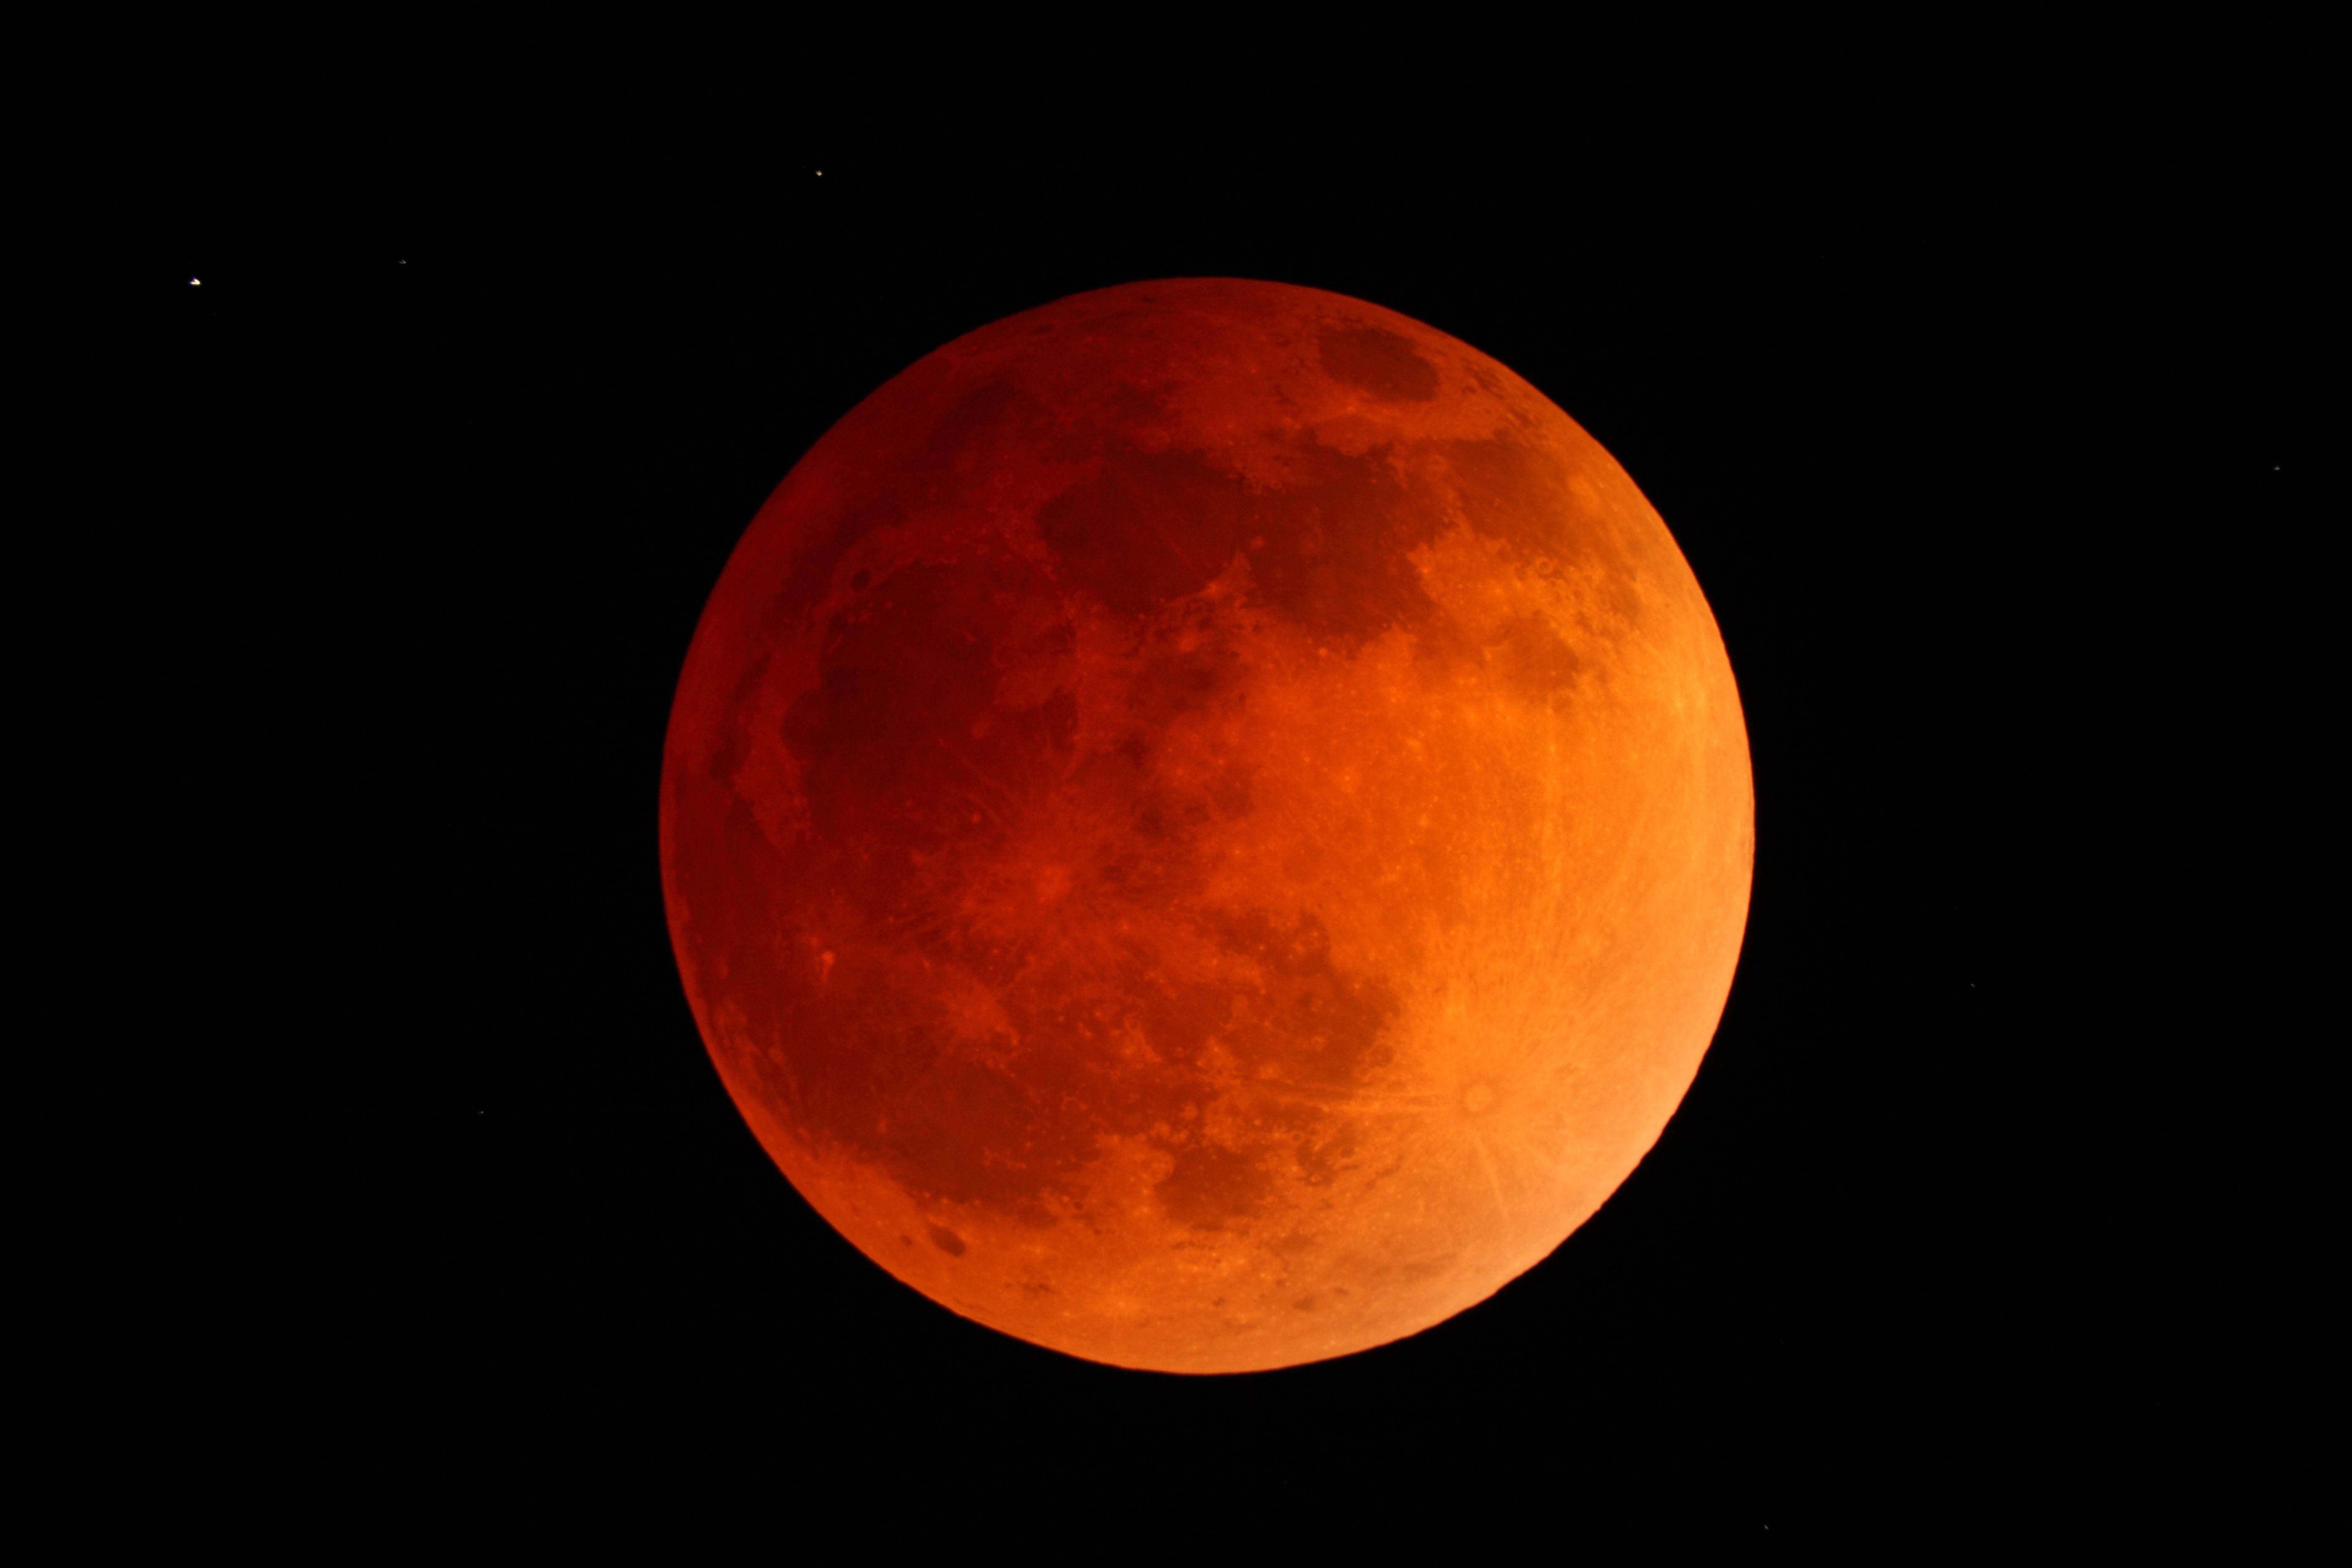 blood moon eclipse kenya - photo #40